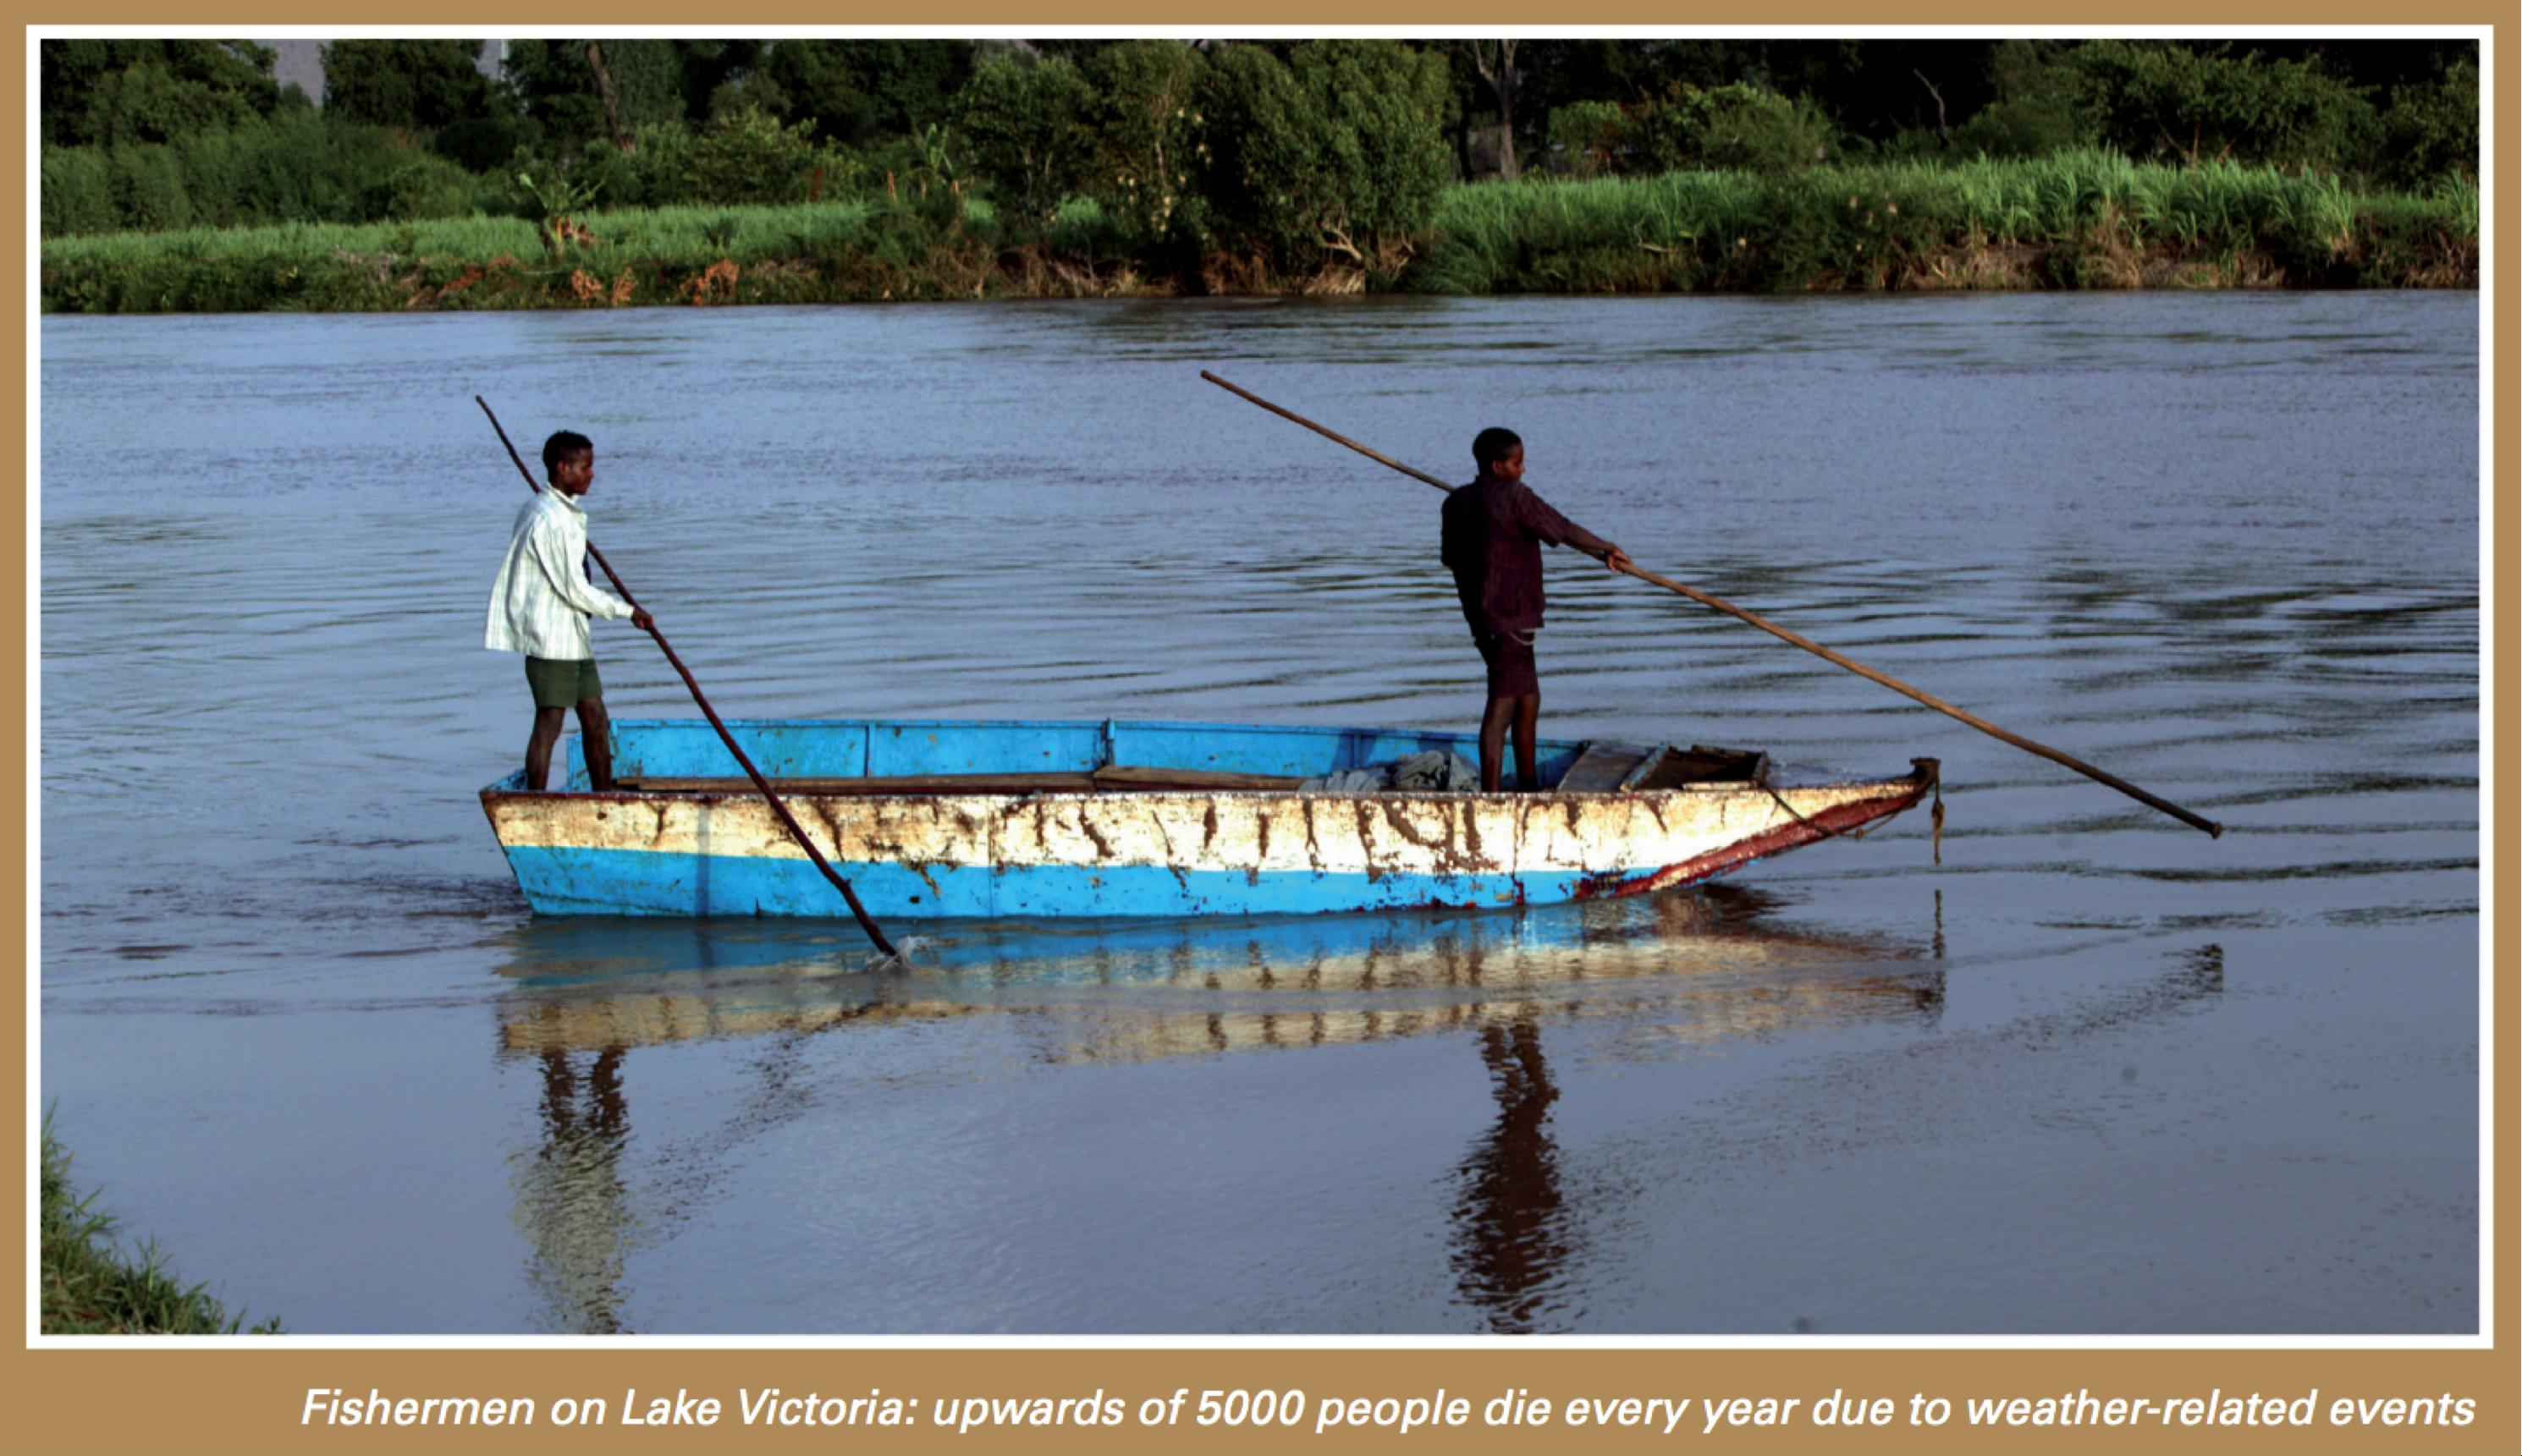 African_boy_on_boat/Amcomet.png